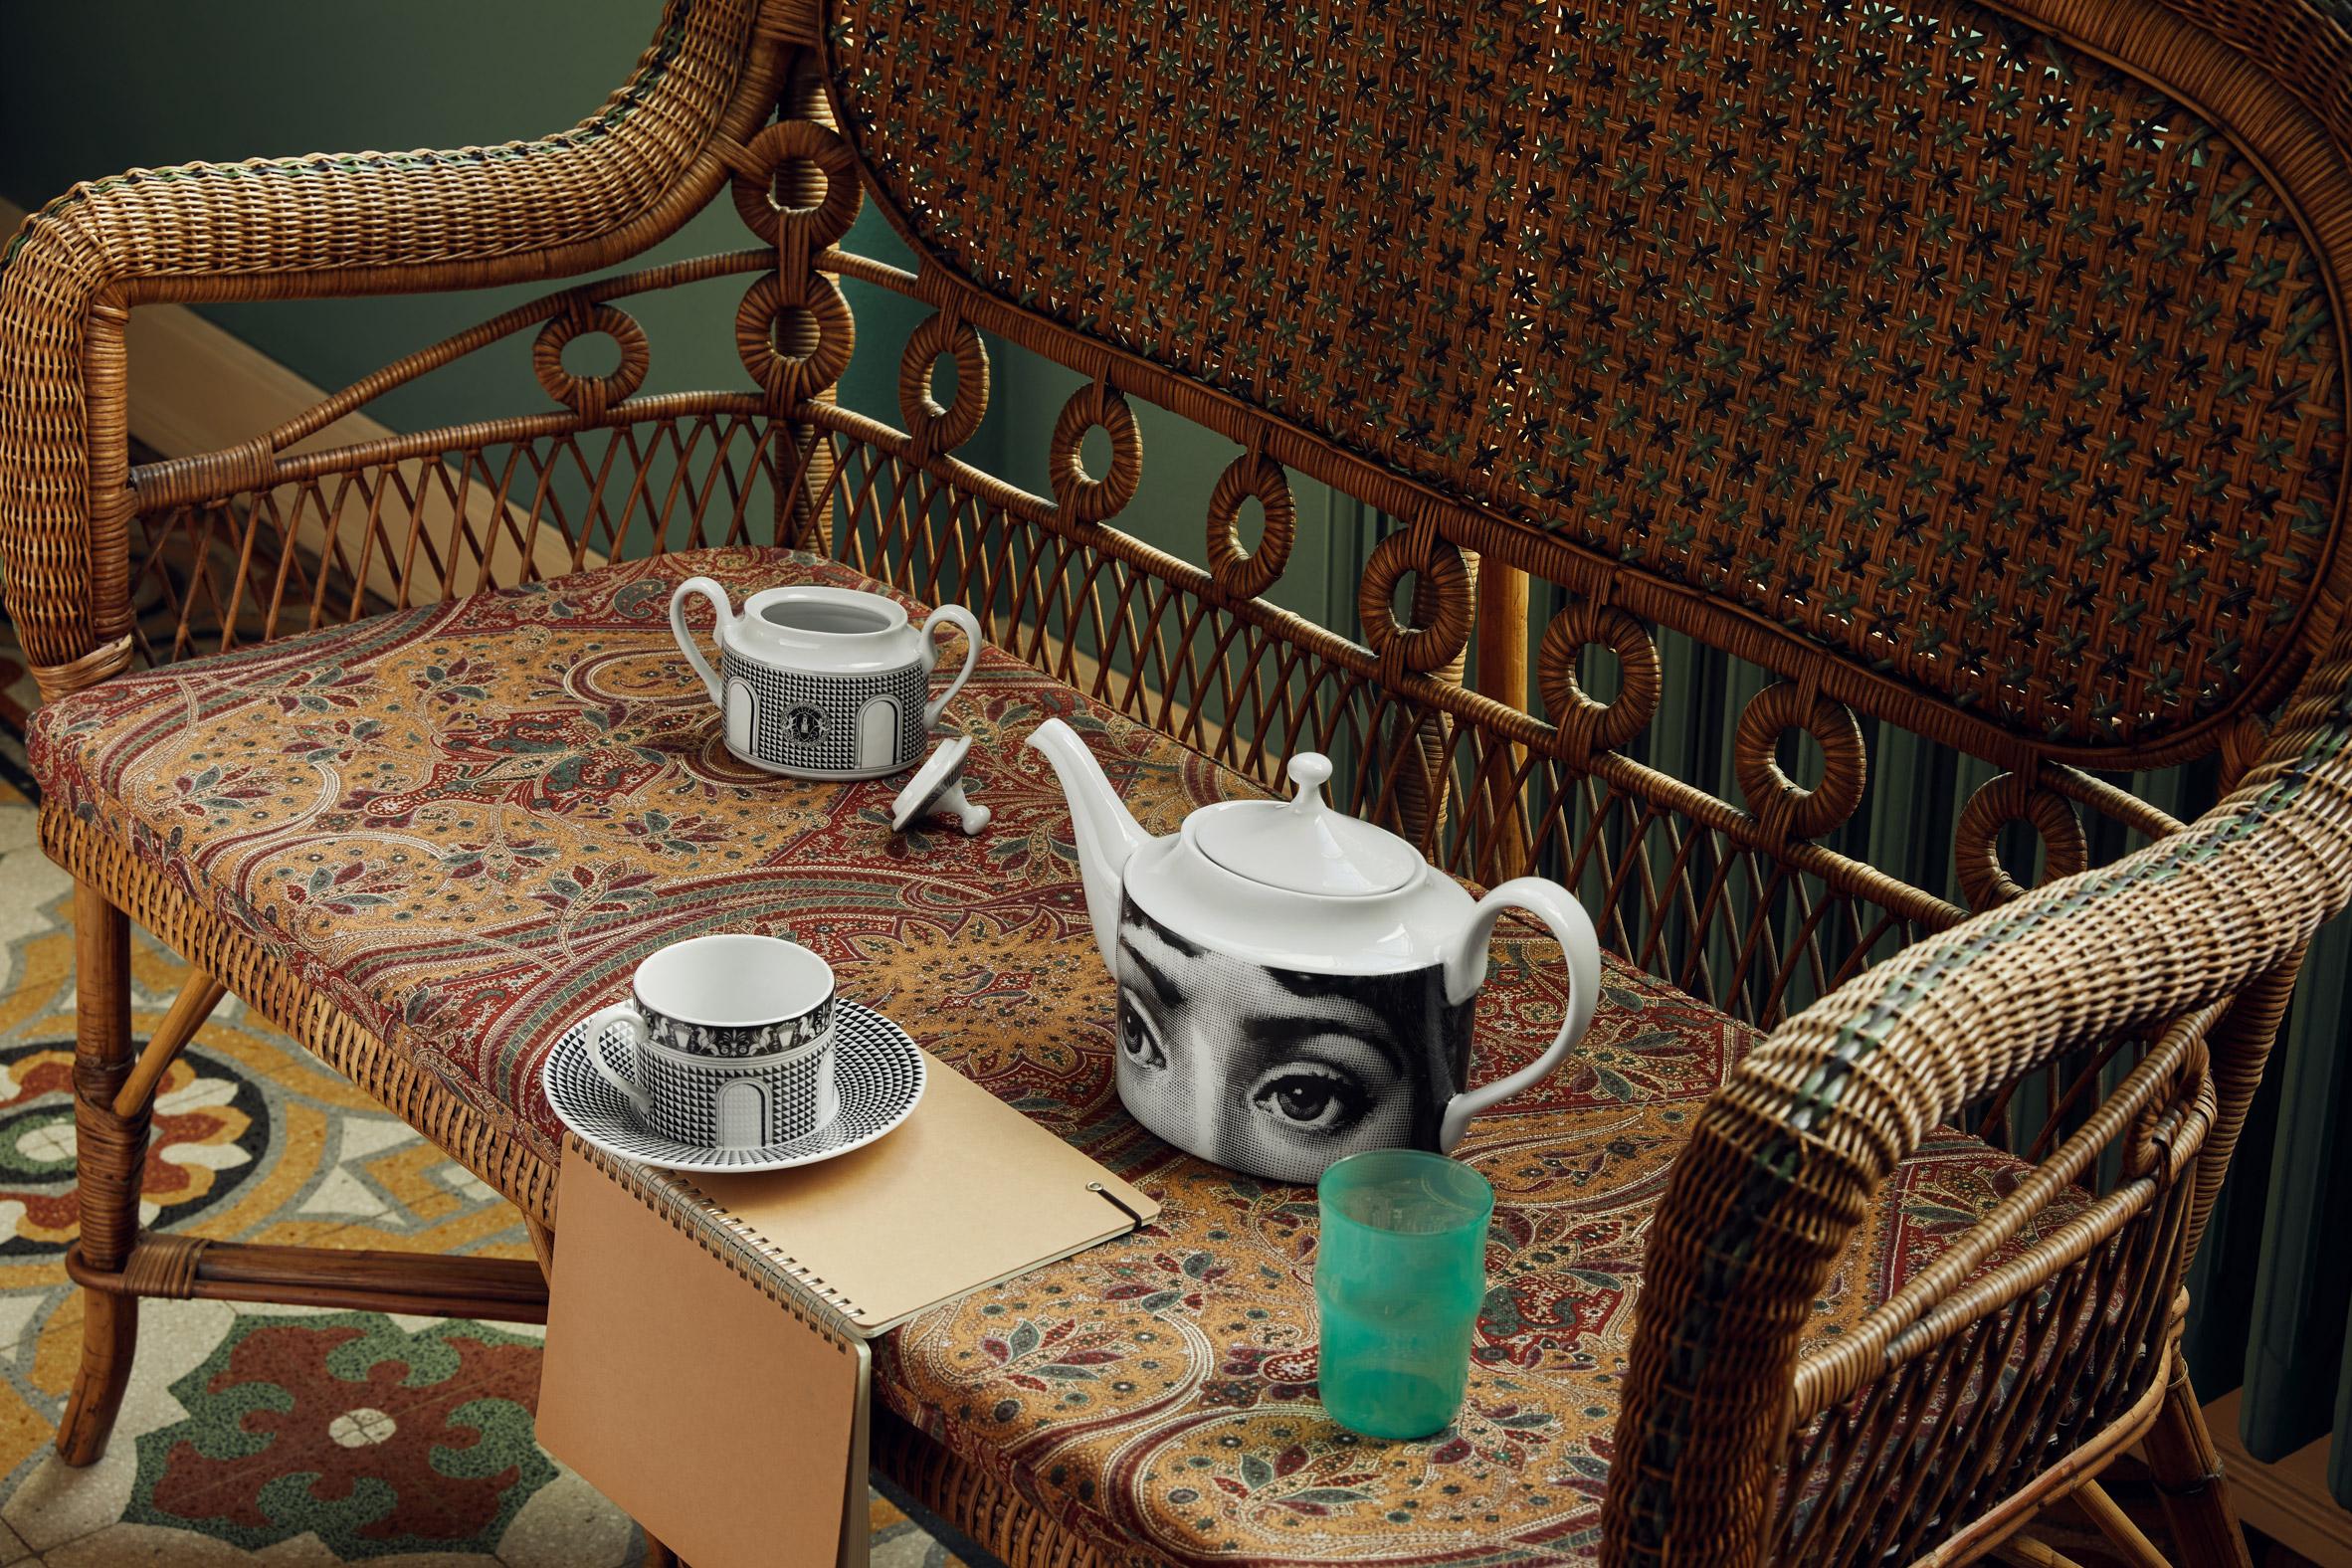 Tea set by Fornasetti